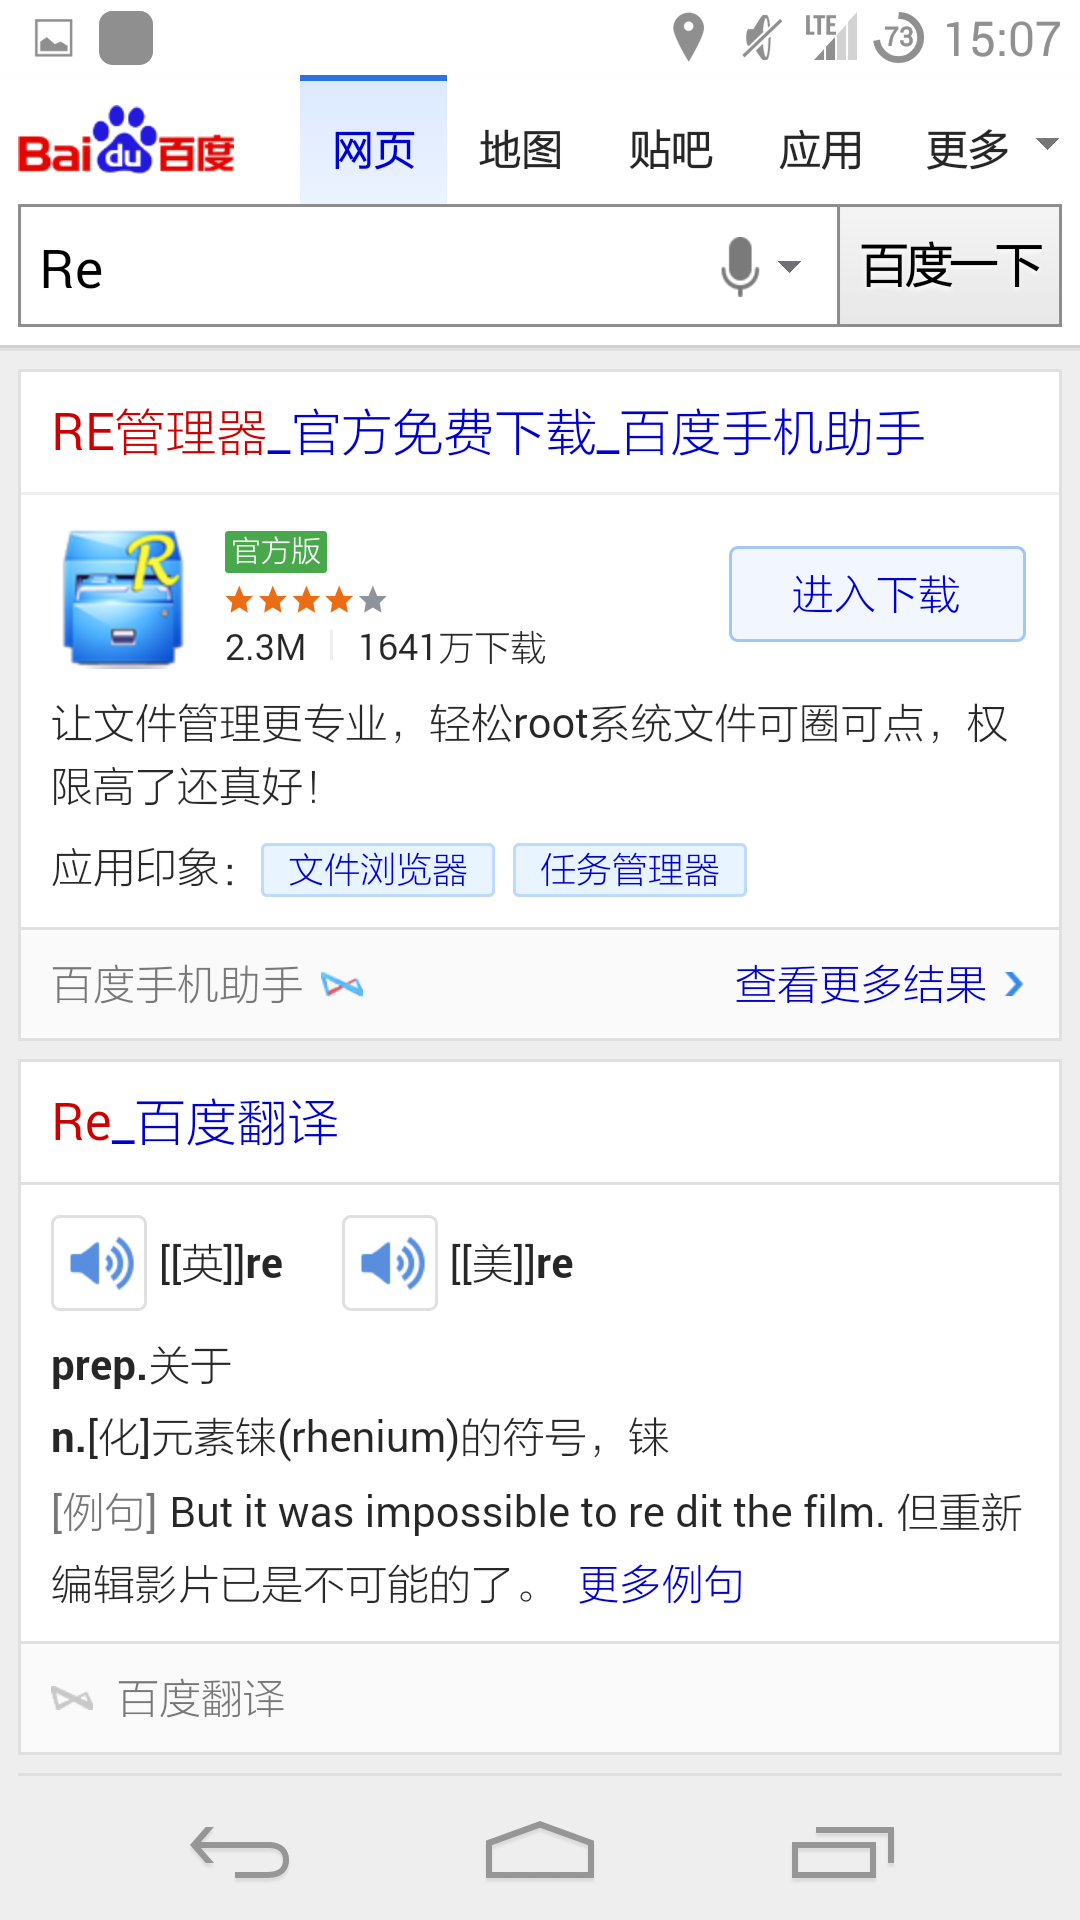 Screenshot_2013-09-17-15-07-27.png